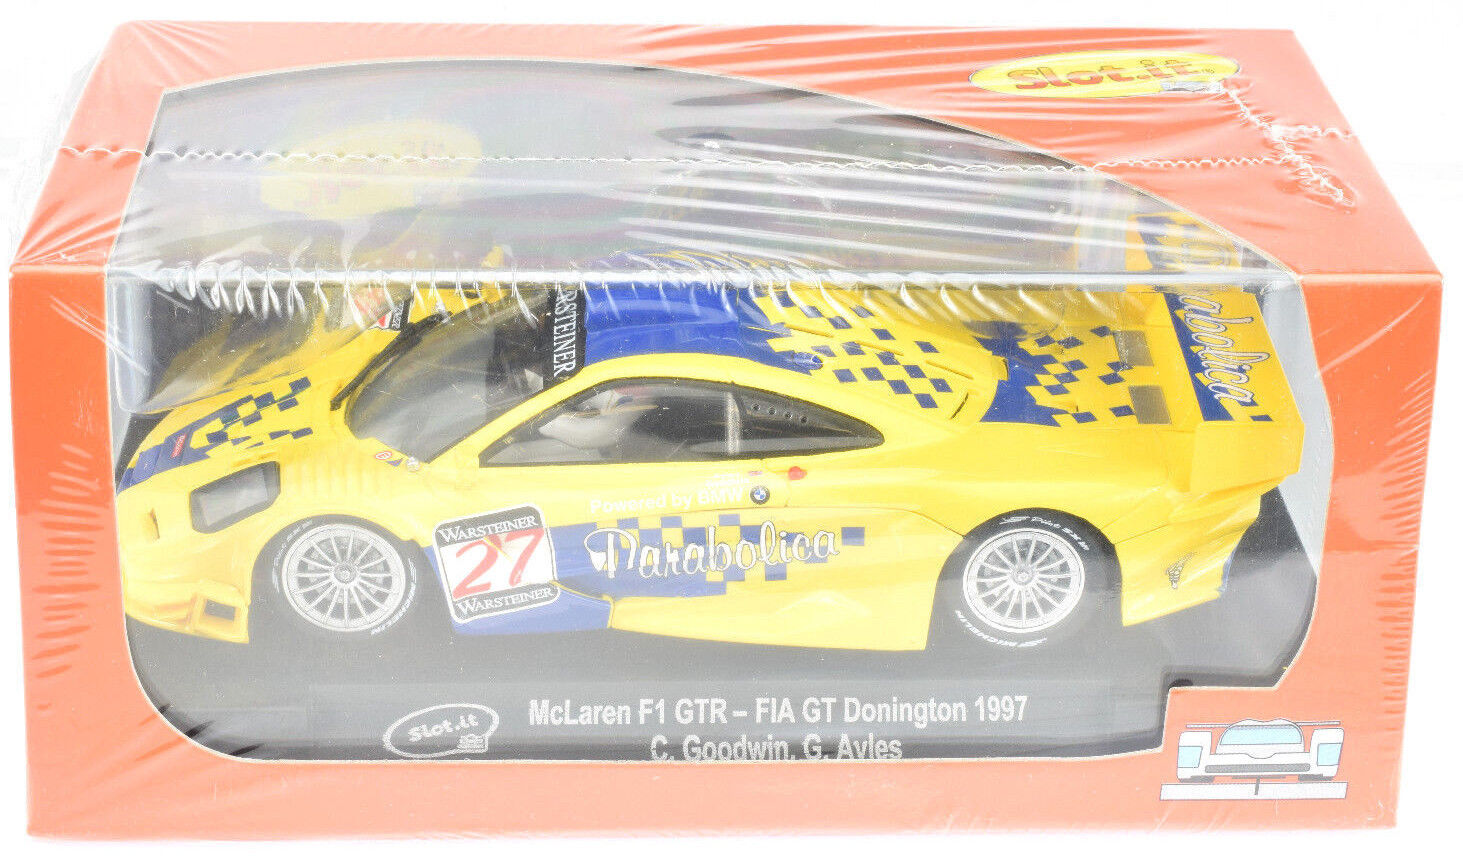 Slot It McLaren F1 GTR - 1997 FIA GT Donington 1 32 Scale slot Car CA10L